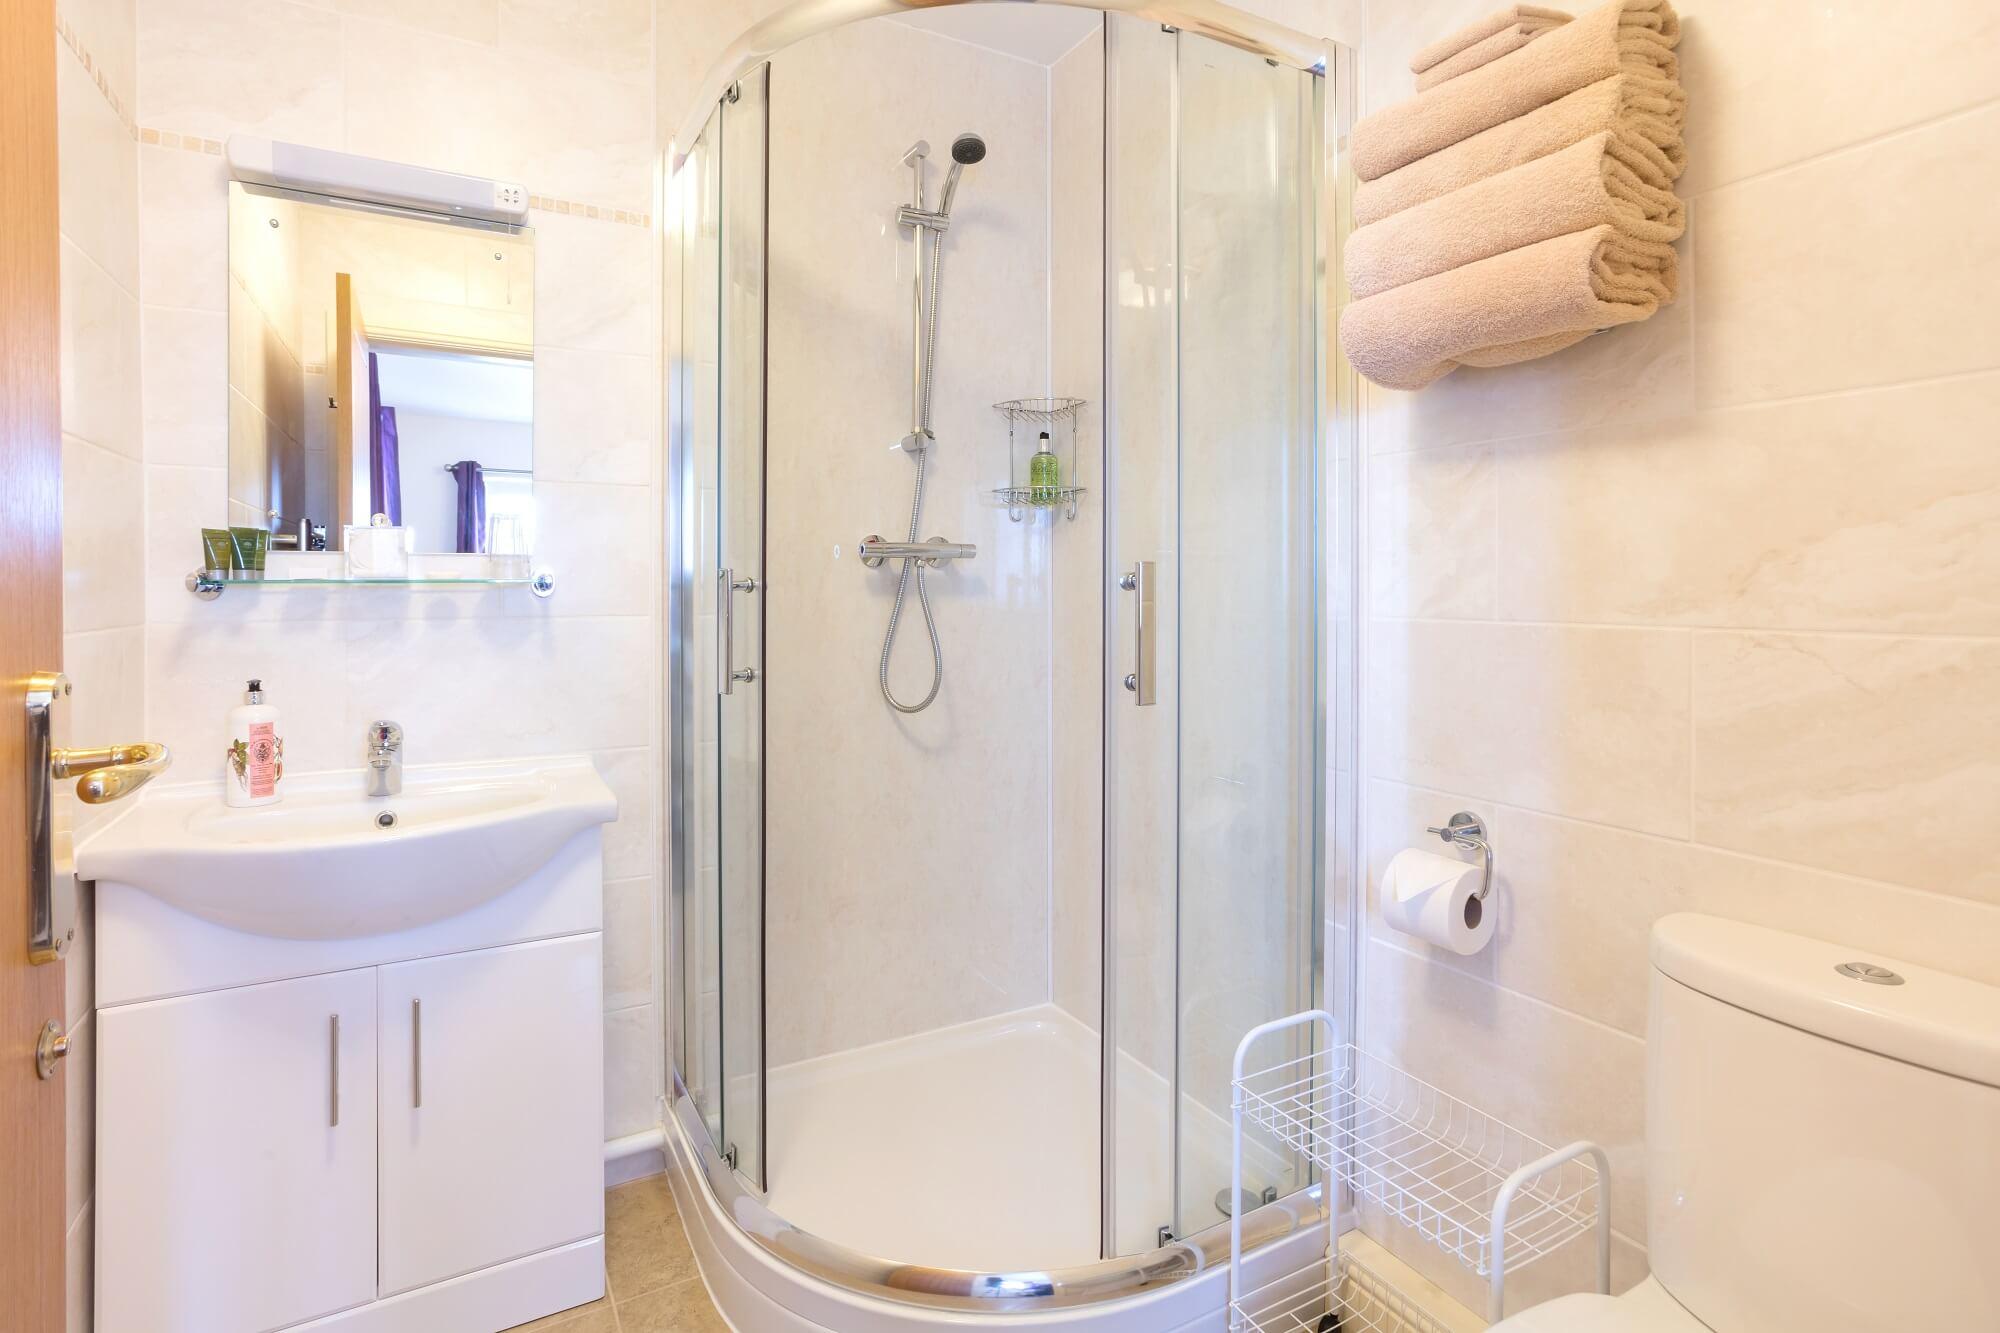 Suite 2 ensuite shower room Redhouse Farm Bed & Breakfast, Lincolnshire